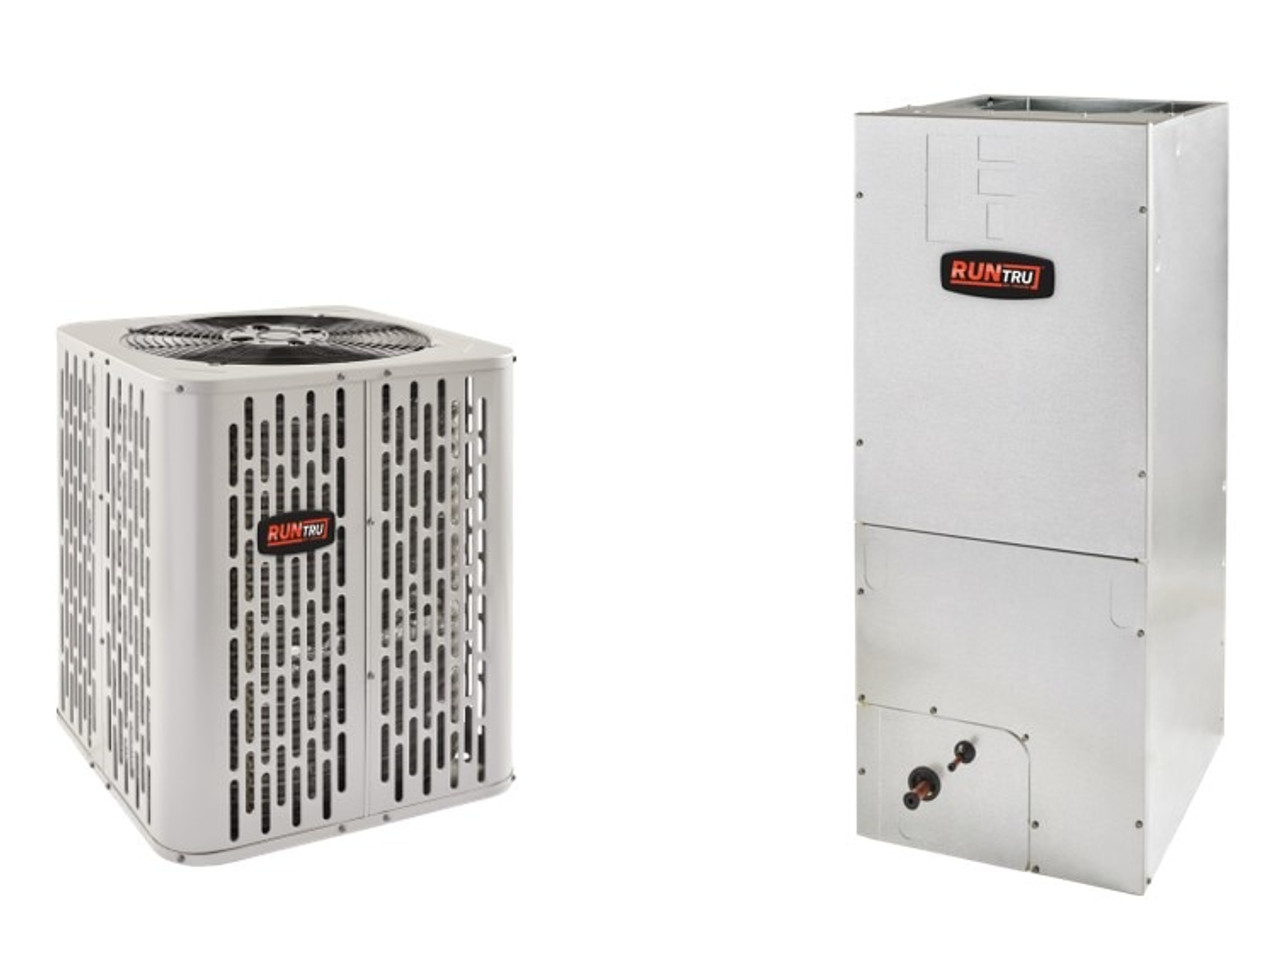 New Ac Depot Sells High Value Diy Central Air Conditioning Direct Including This Runtru By Trane 2 5 Ton Heat Pump Condenser Model A4hp4030a1000a Air Handler Model A4ah4p36a1b30a